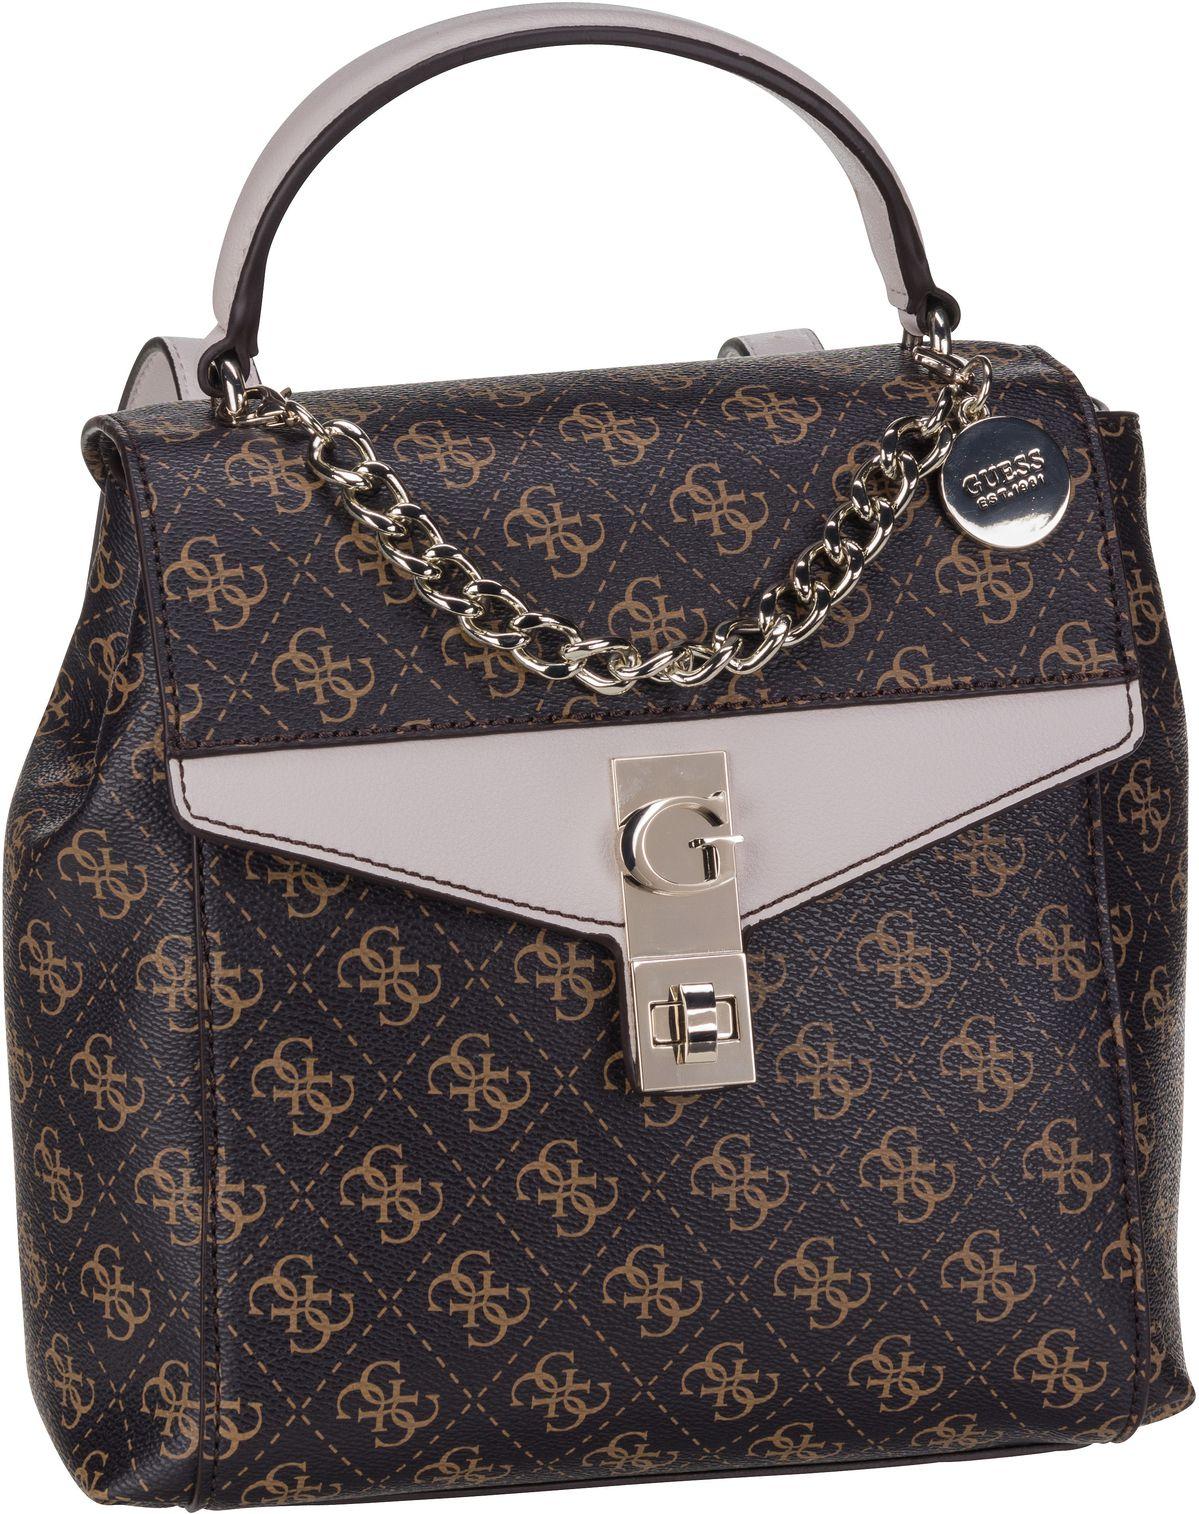 Rucksack / Daypack Lorenna Convertible Backpack Brown